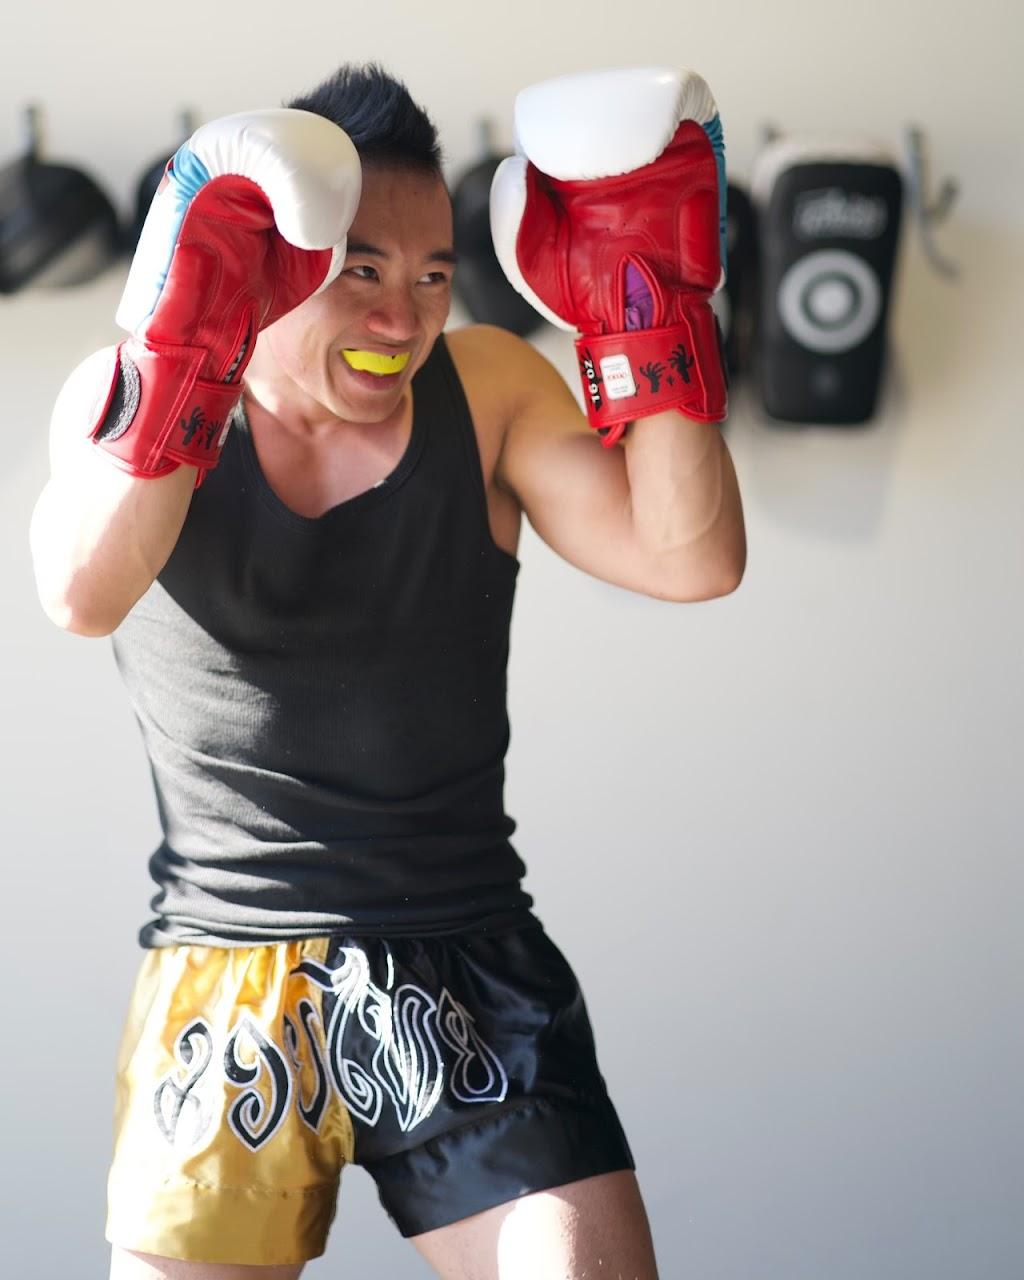 Logic Jiu Jitsu, Muay Thai, & Martial Arts - health  | Photo 3 of 10 | Address: 1360 N American St, Philadelphia, PA 19122, USA | Phone: (215) 593-0060